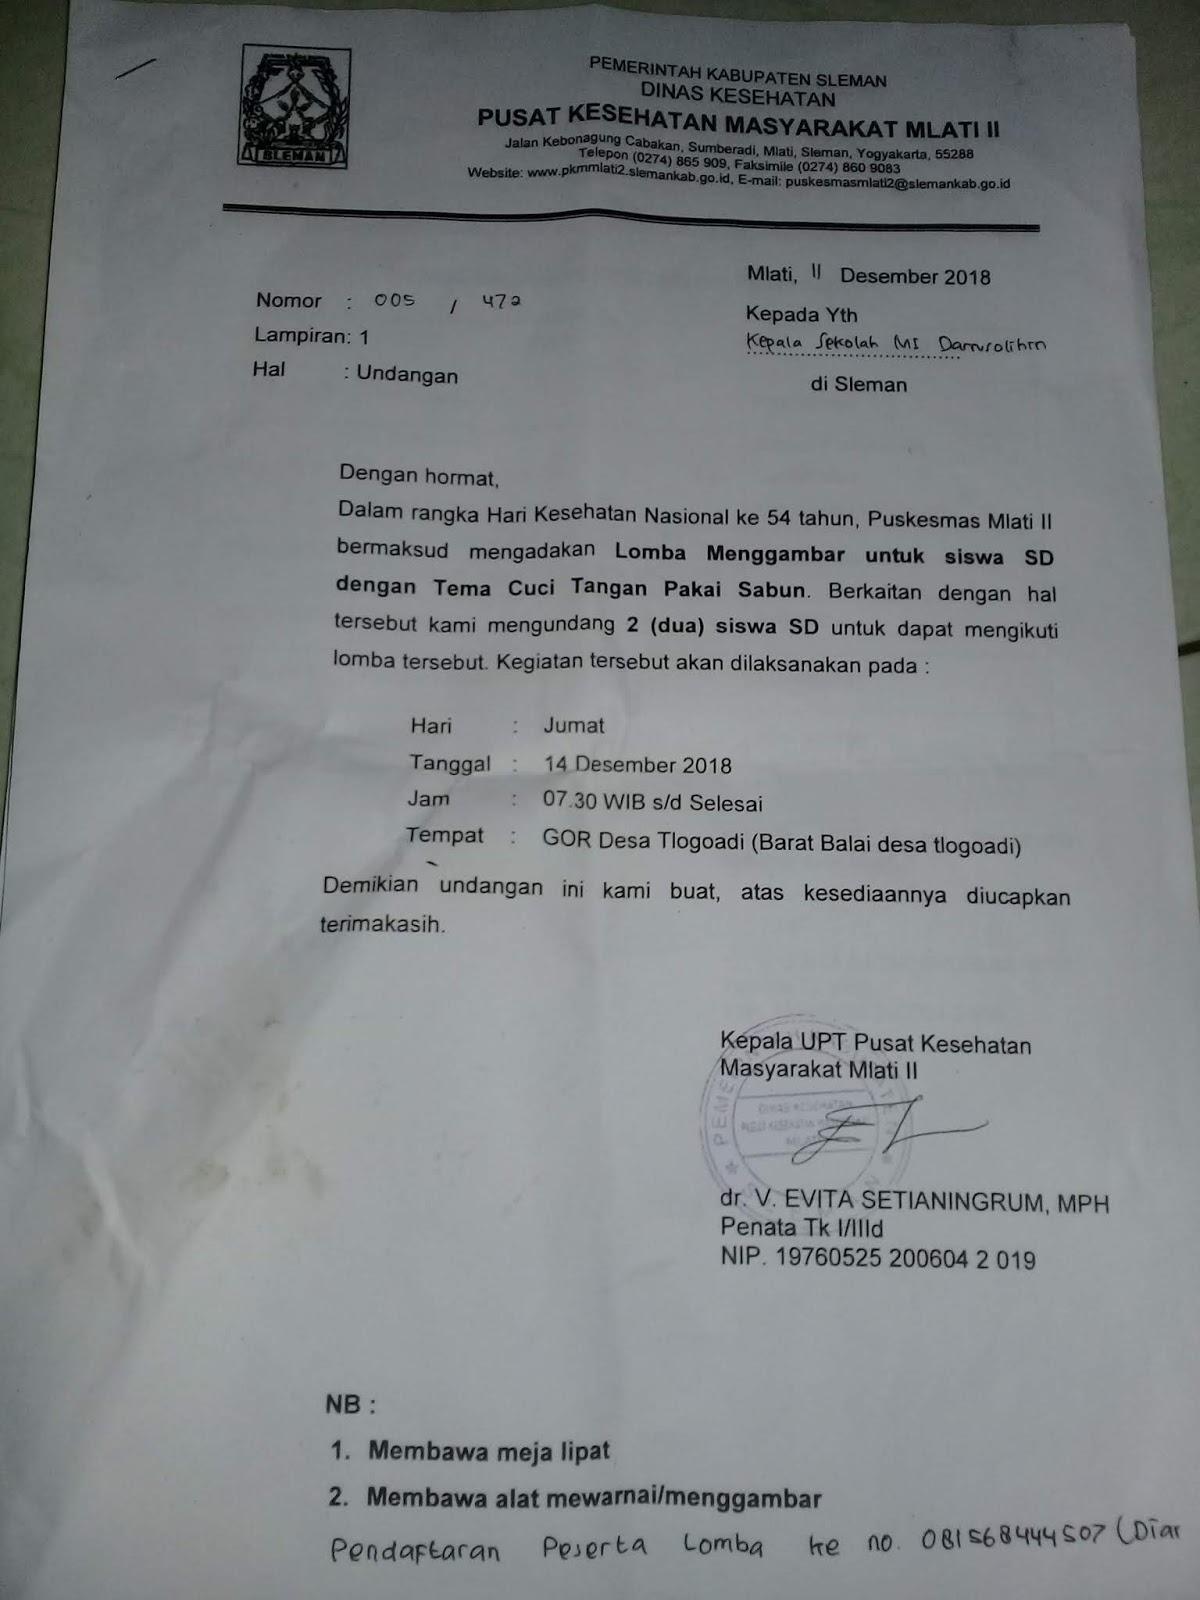 Contoh Undangan Perlombaan Olahraga Studi Indonesia